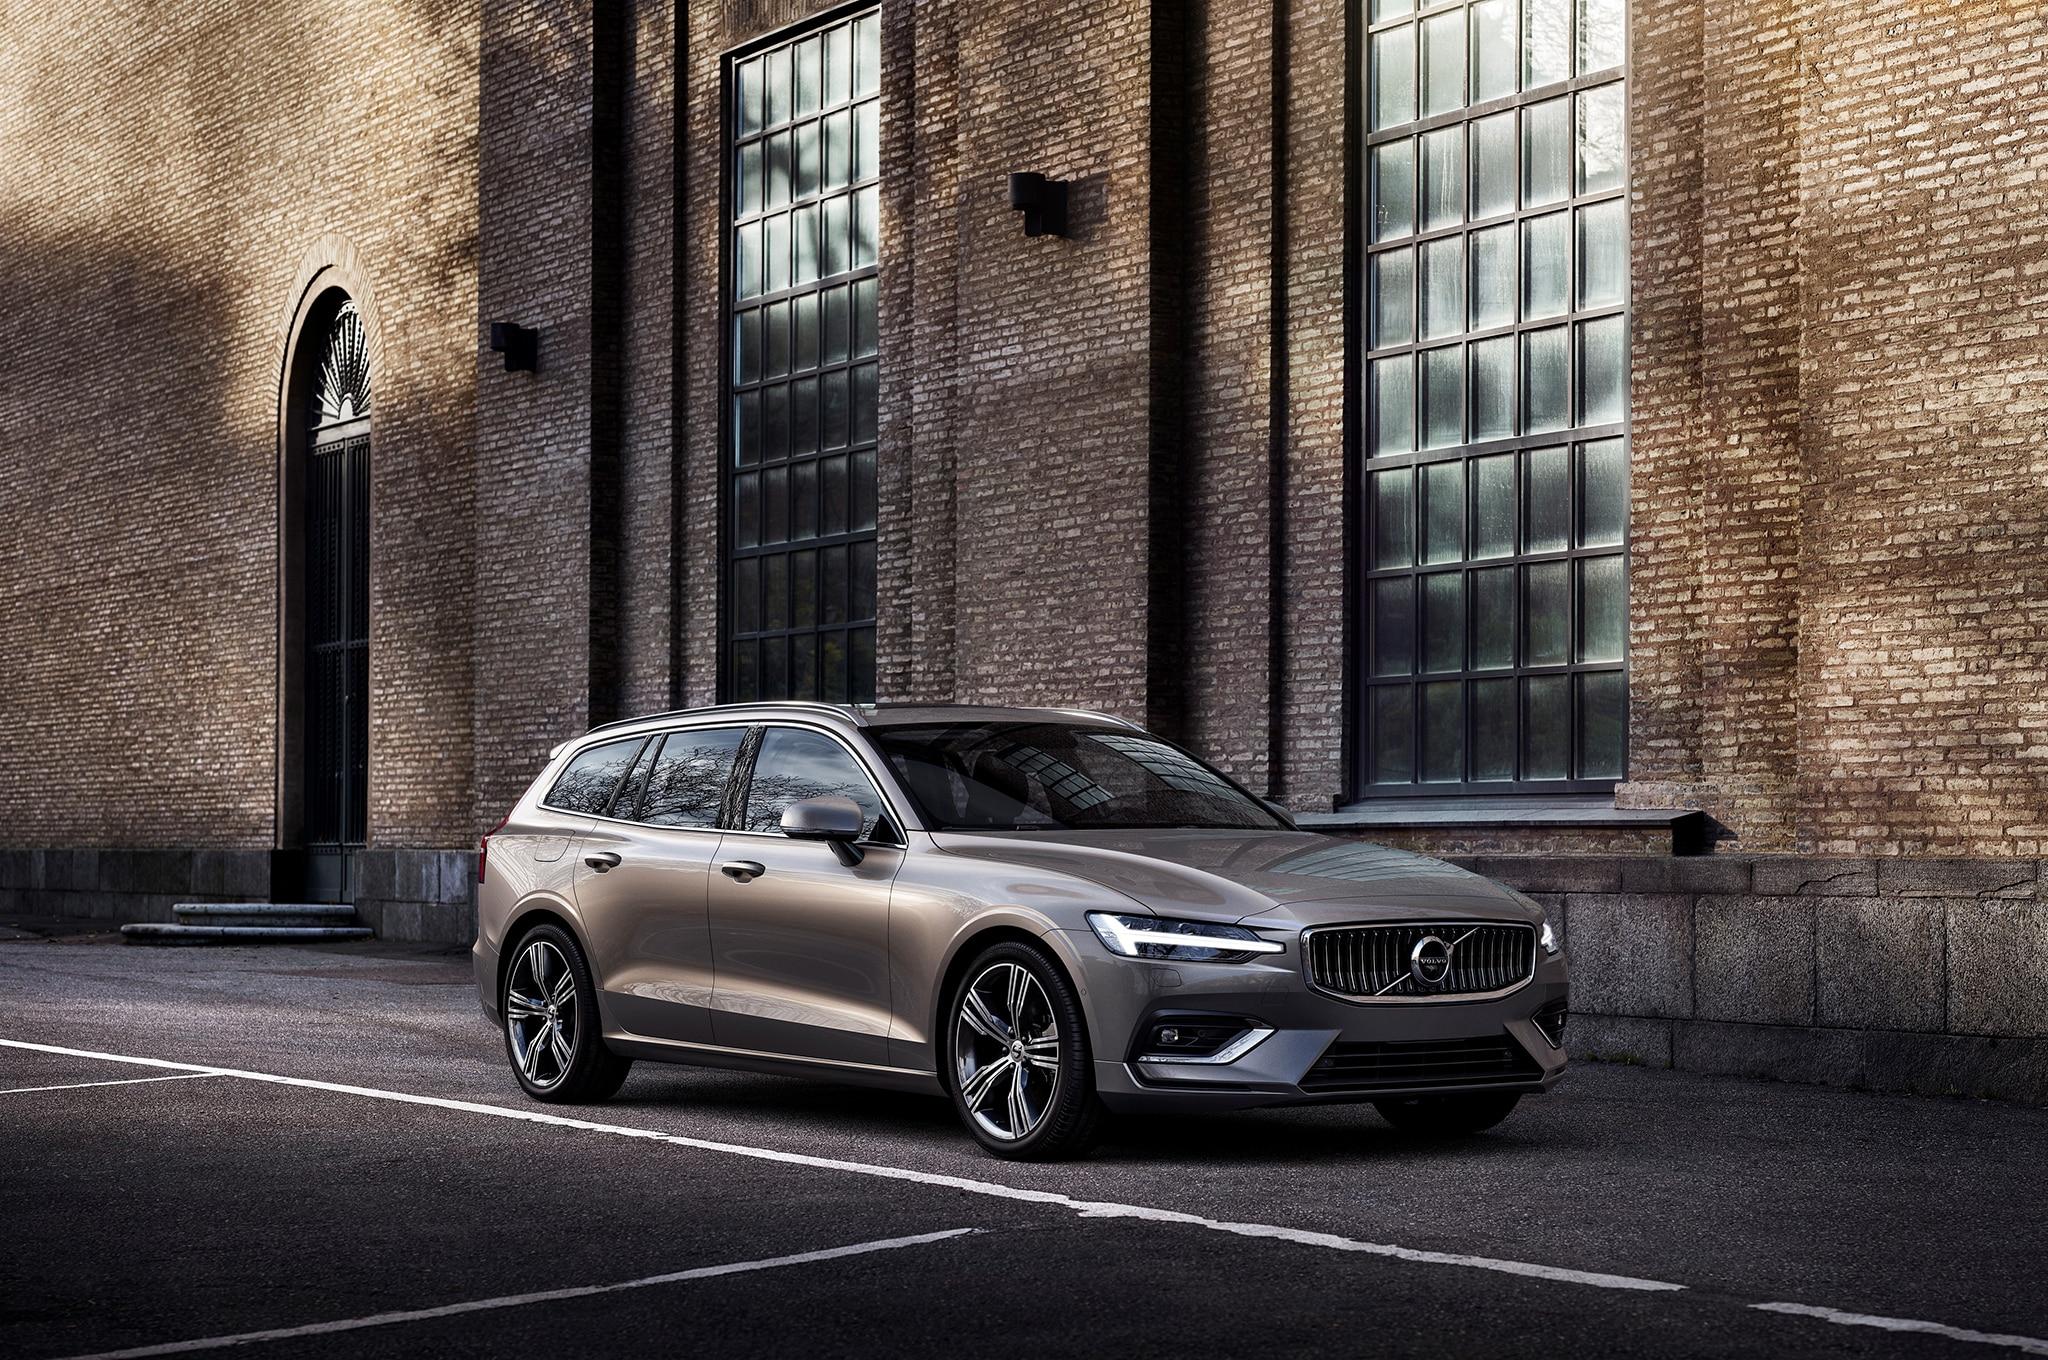 2019 Volvo V60 Front Three Quarter 4